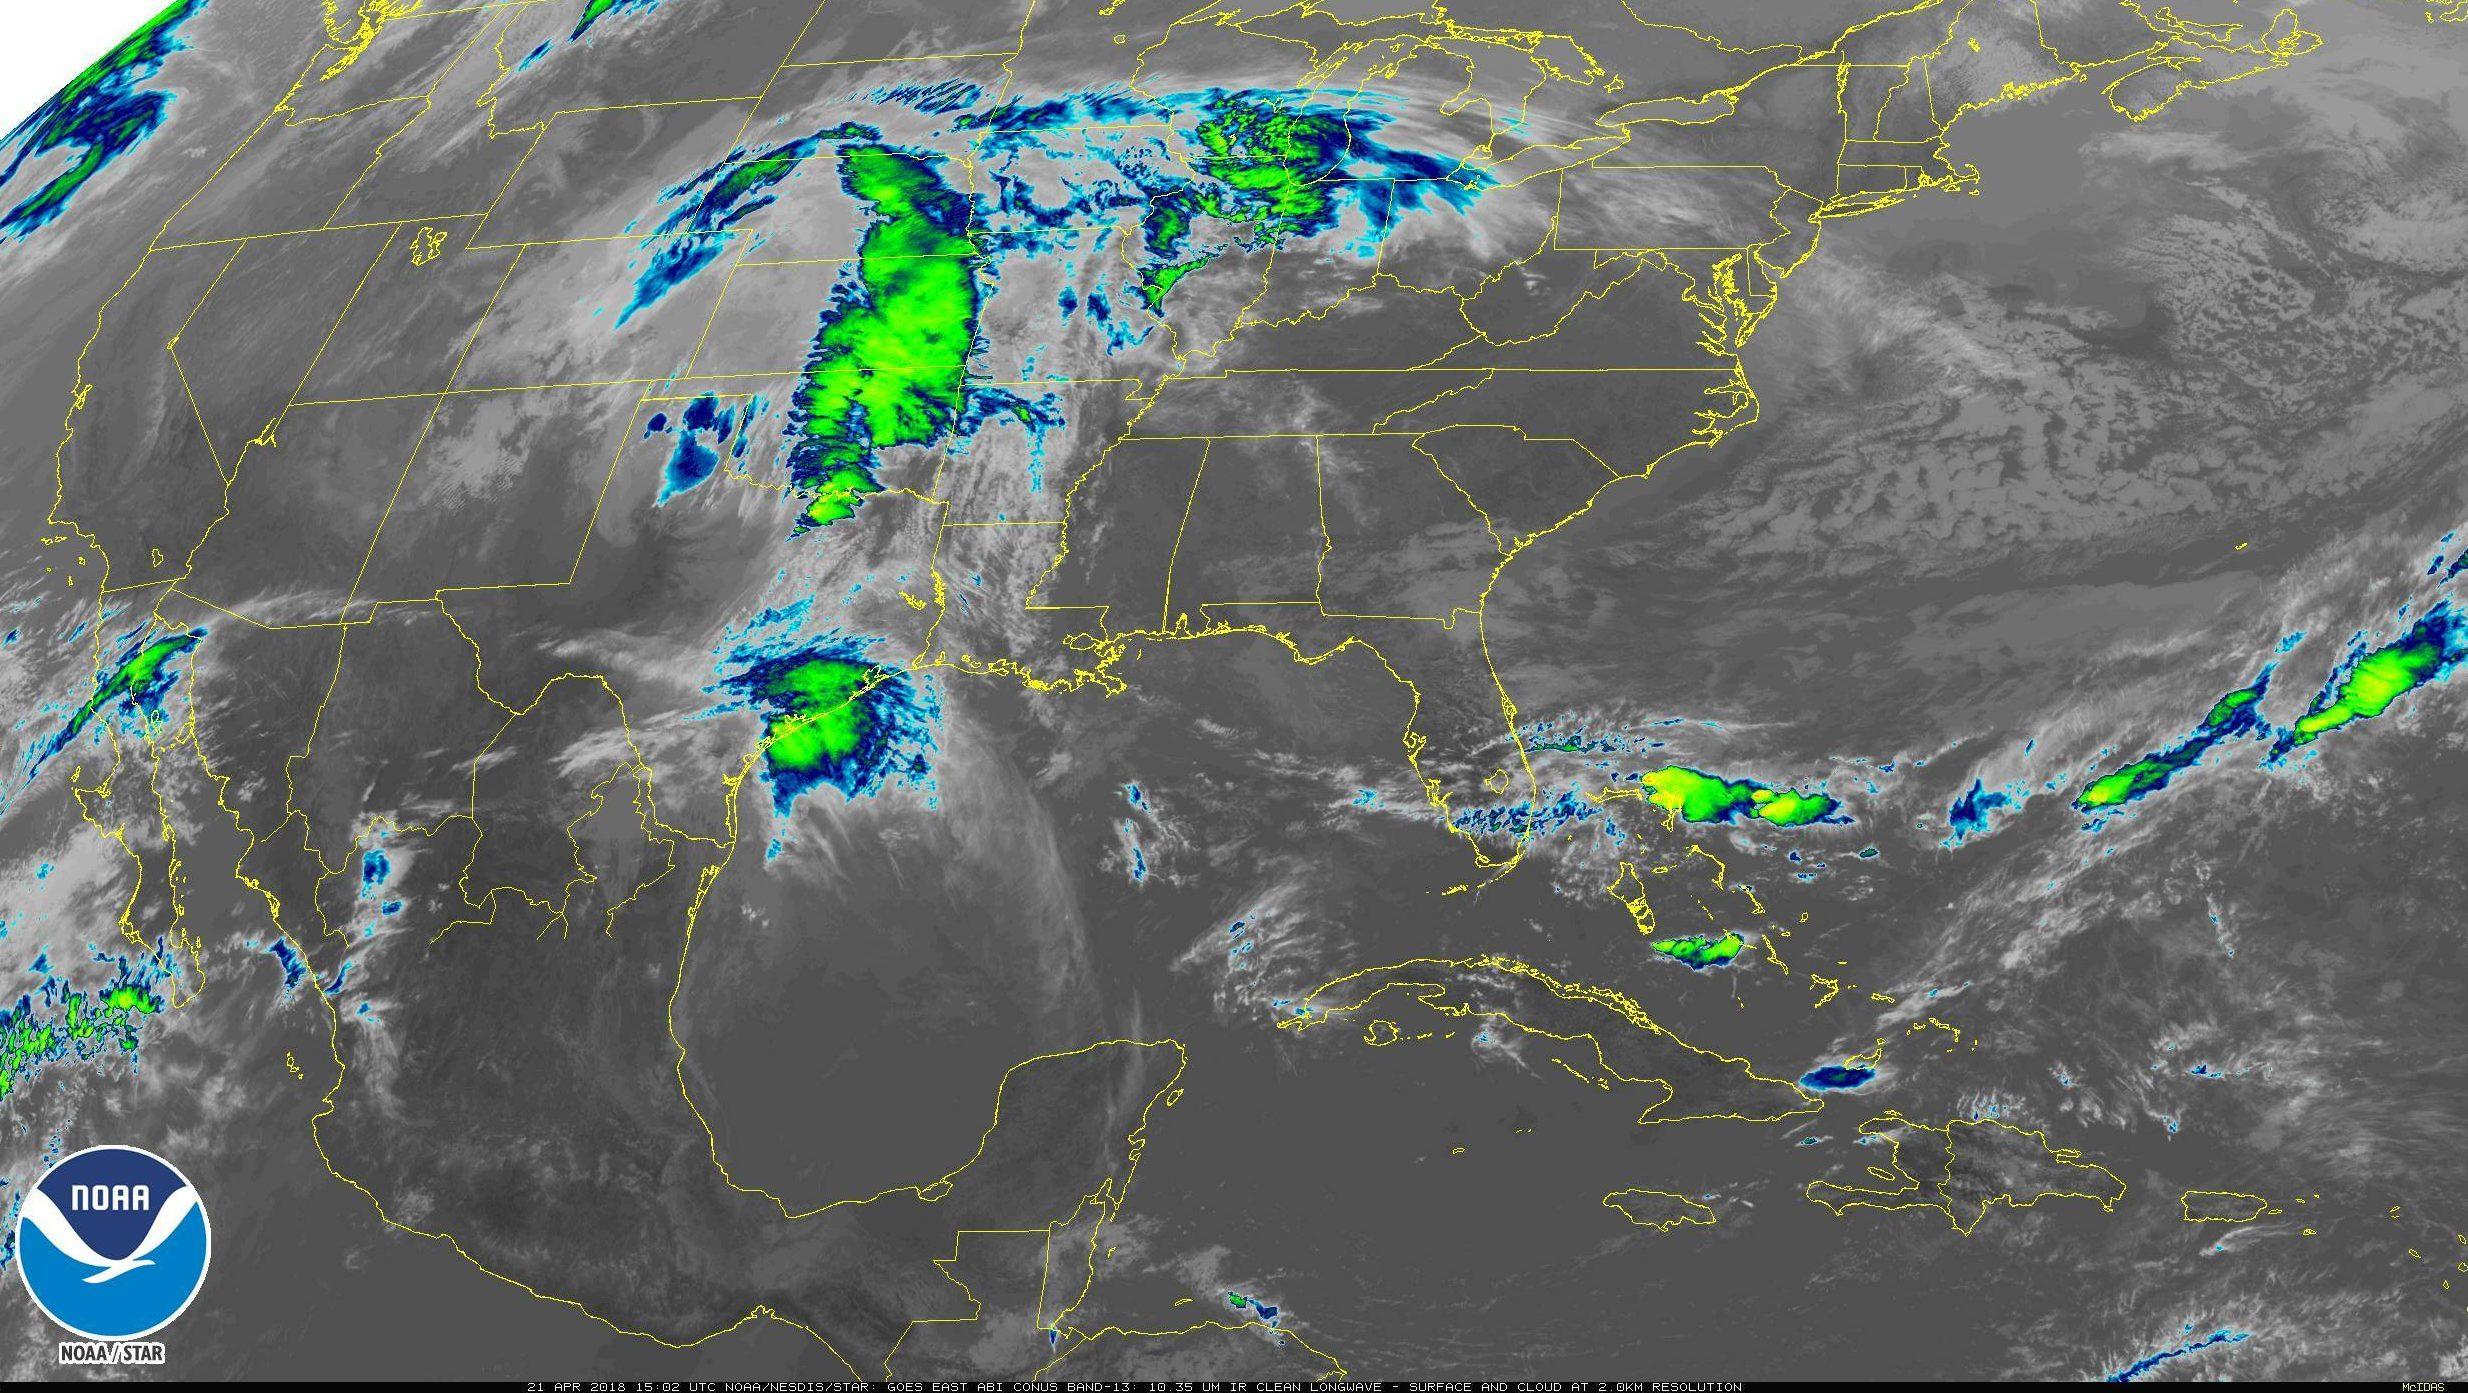 Satellite image of the US